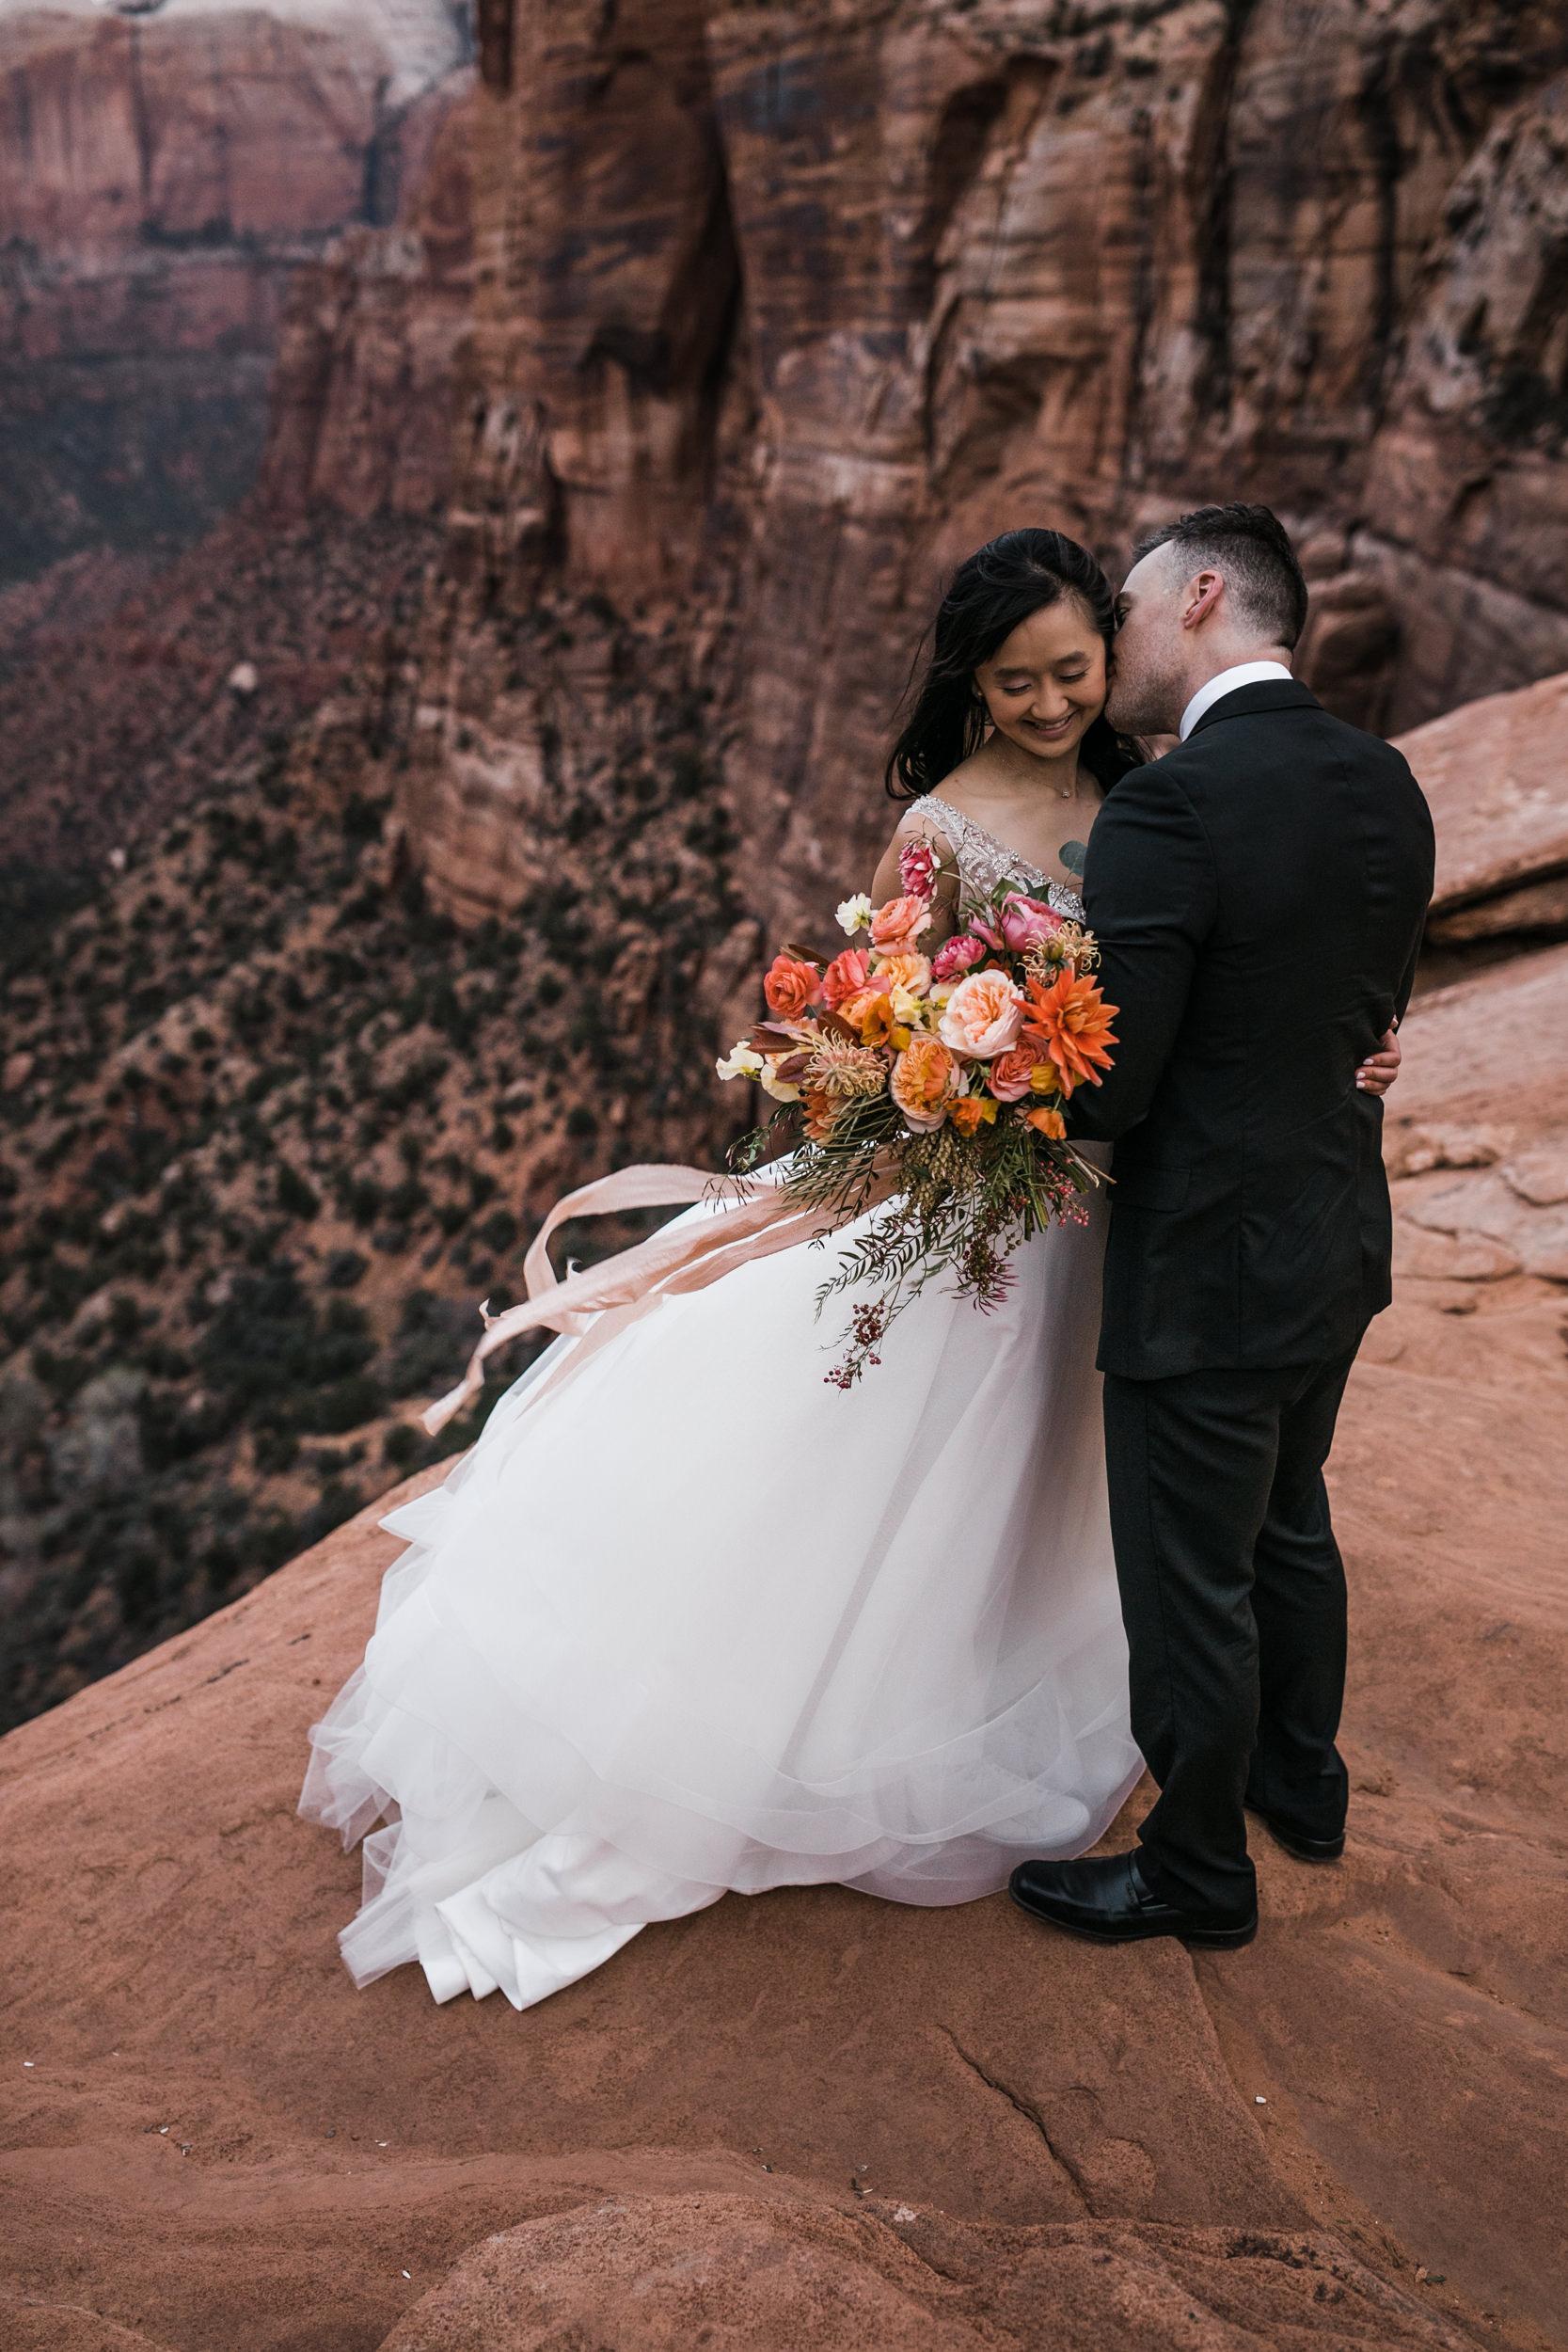 Zion-National-Park-Sunrise-Elopement-Hearnes-Wedding-Photography-15.jpg